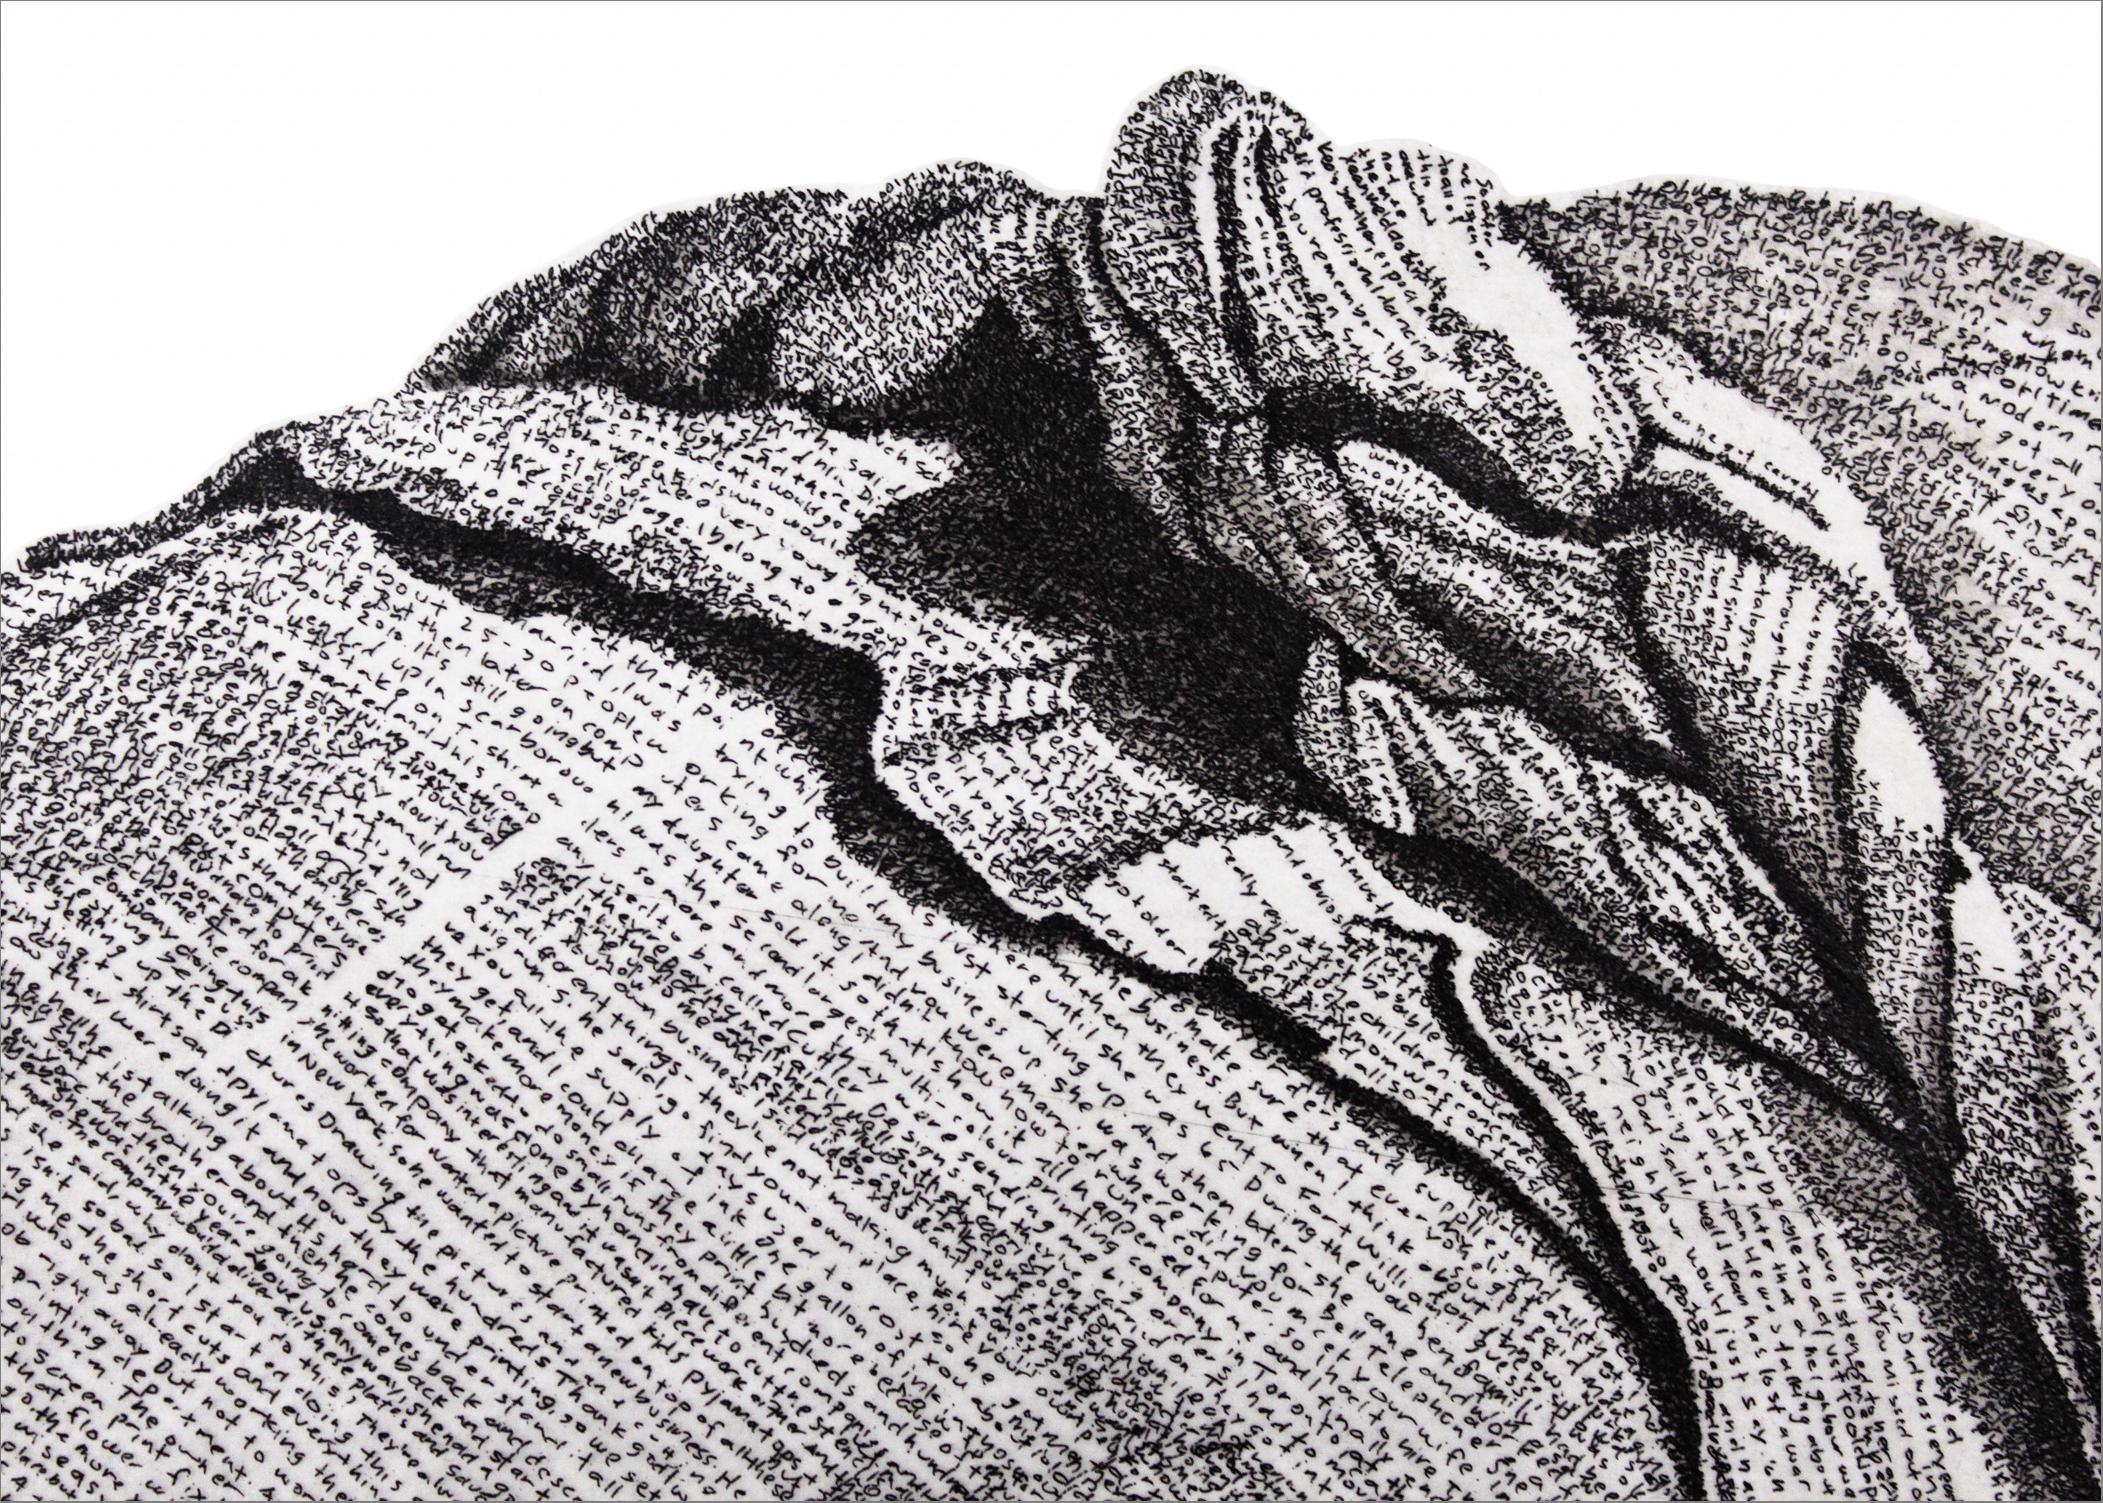 Harold Miwa – Detail 1